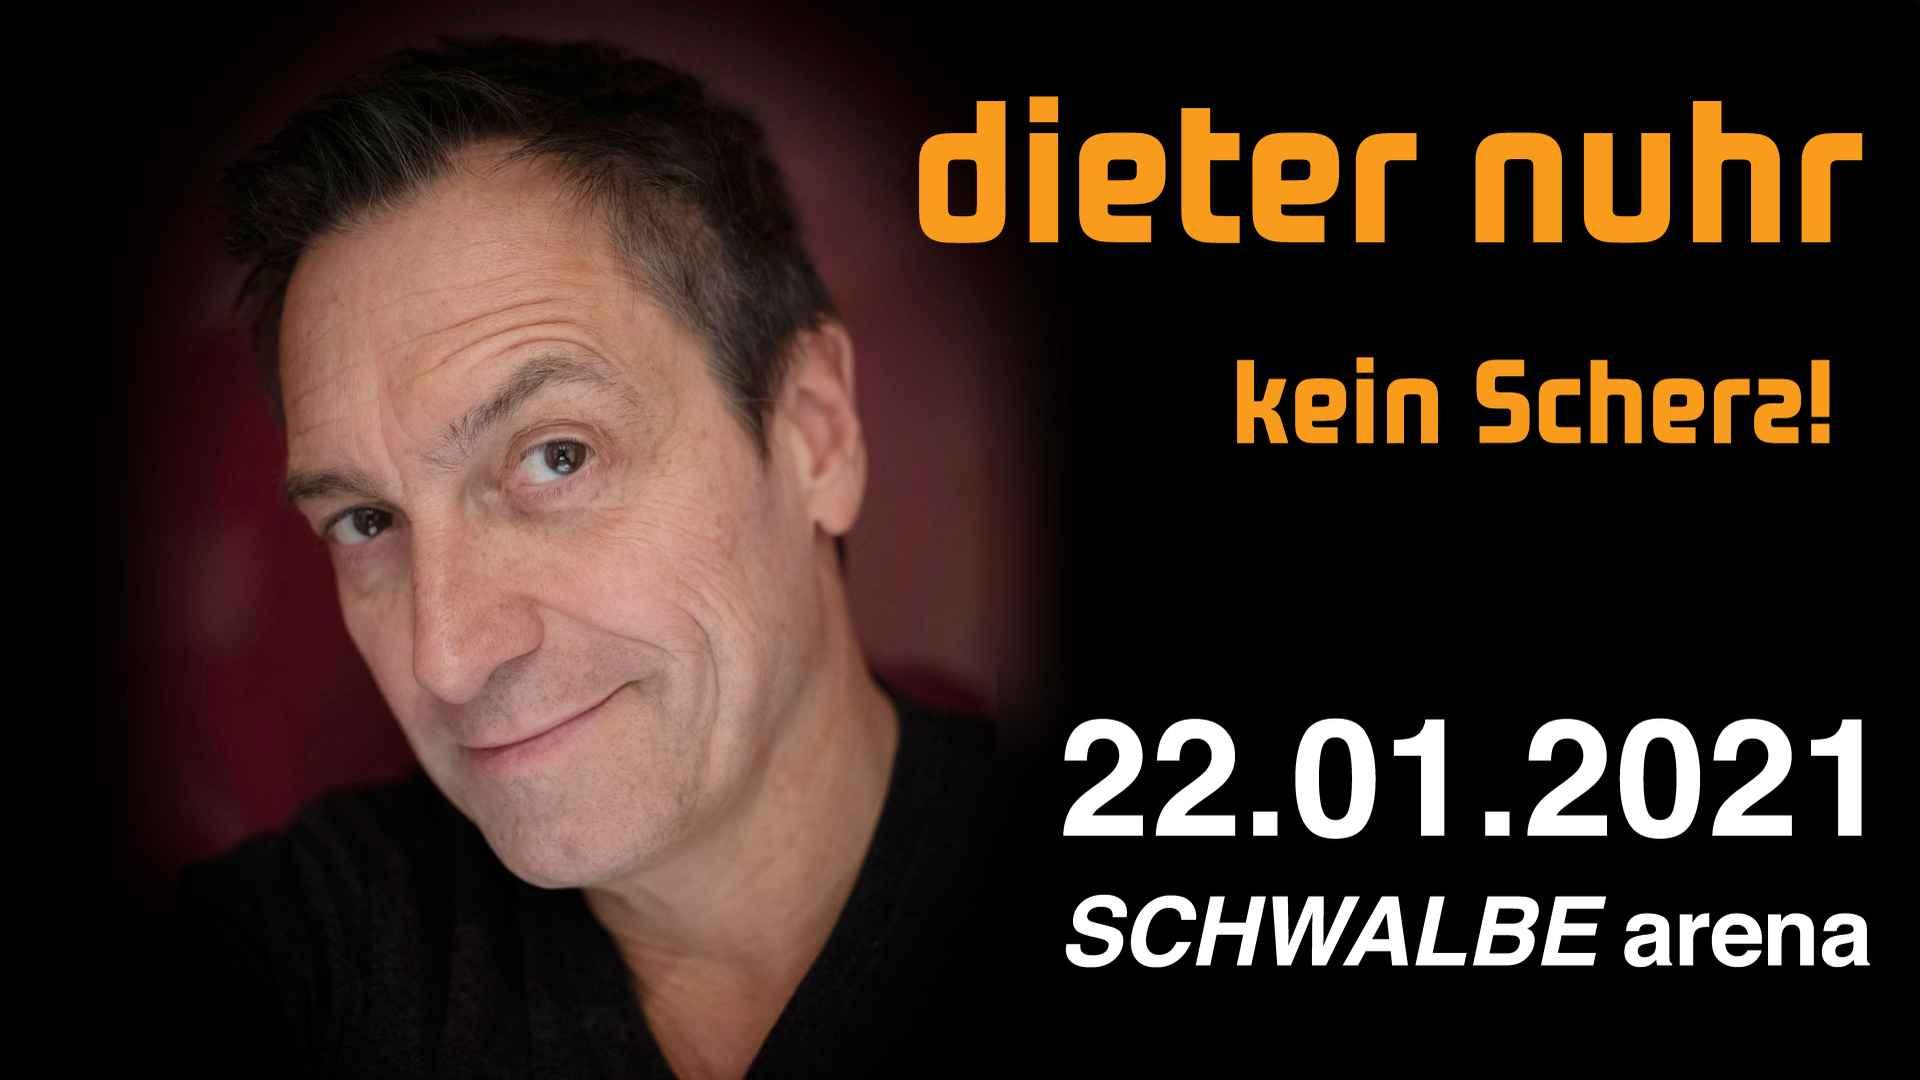 Dieter Nuhr Berlin 2021